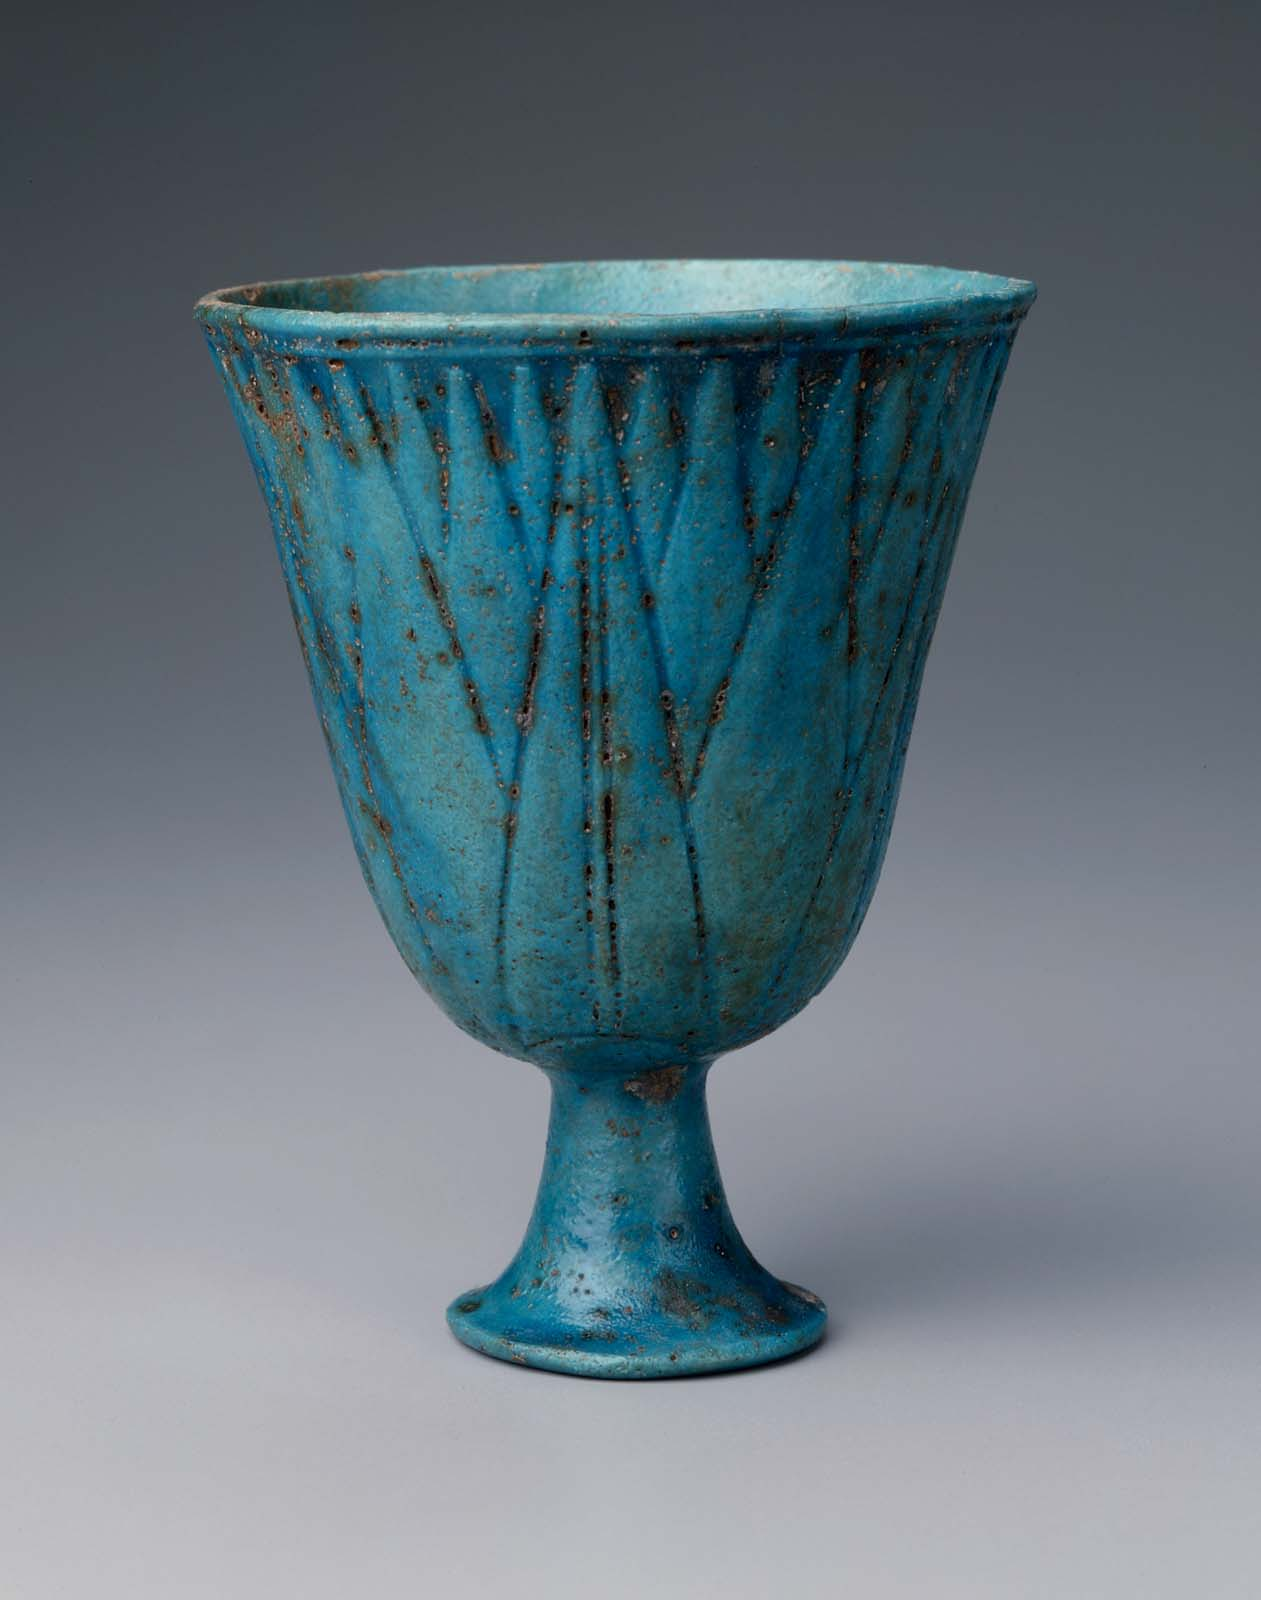 Blue lotus chalice museum of fine arts boston blue lotus chalice egyptian izmirmasajfo